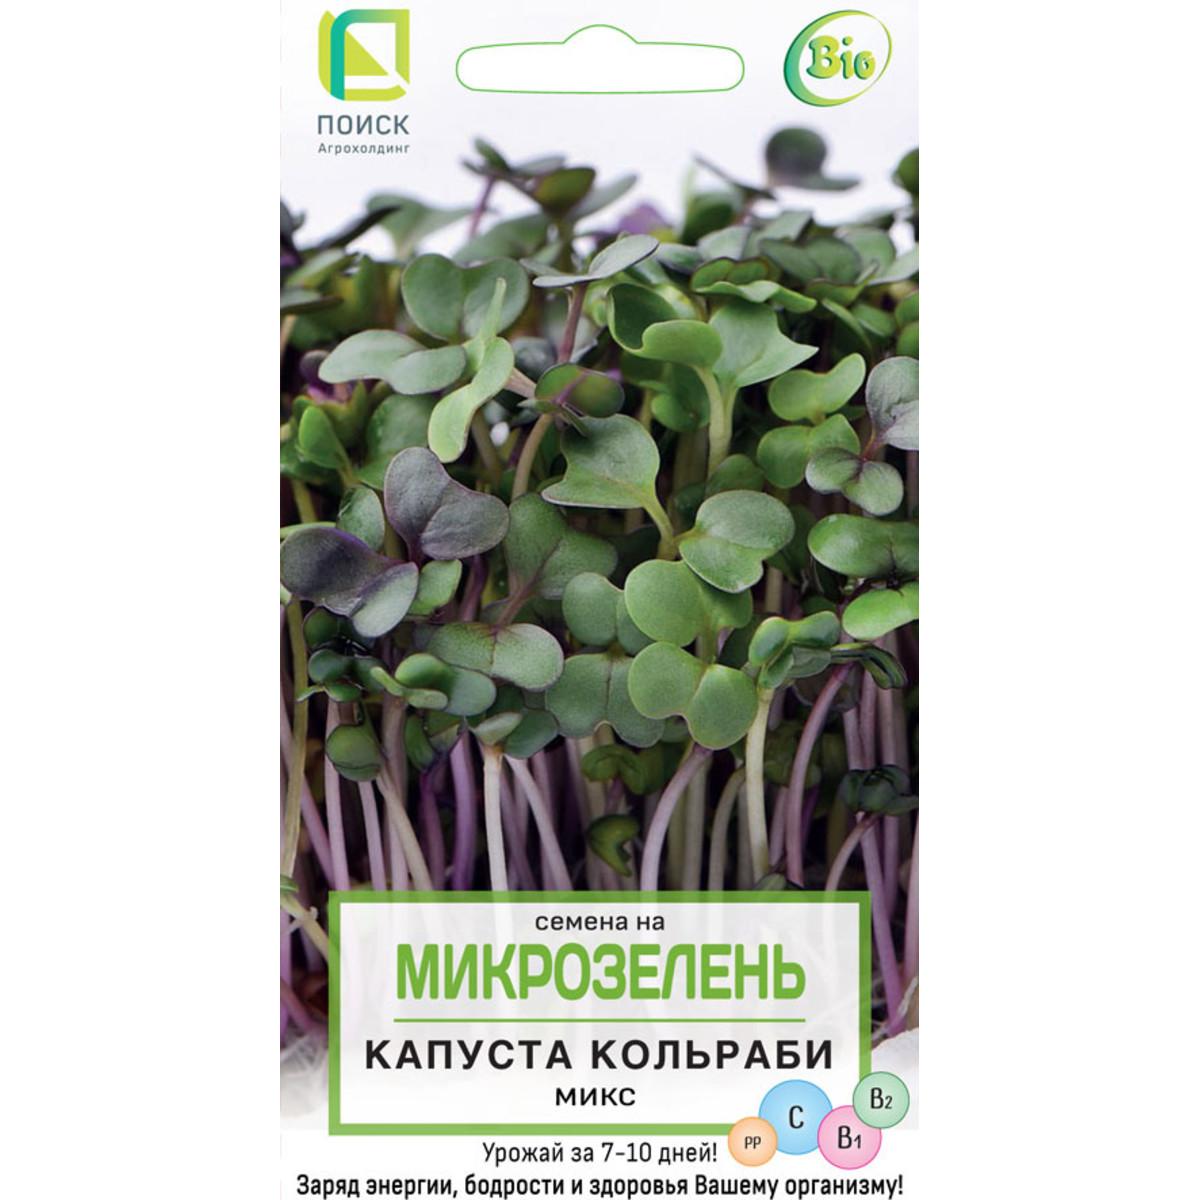 микрозелень леруа мерлен семена